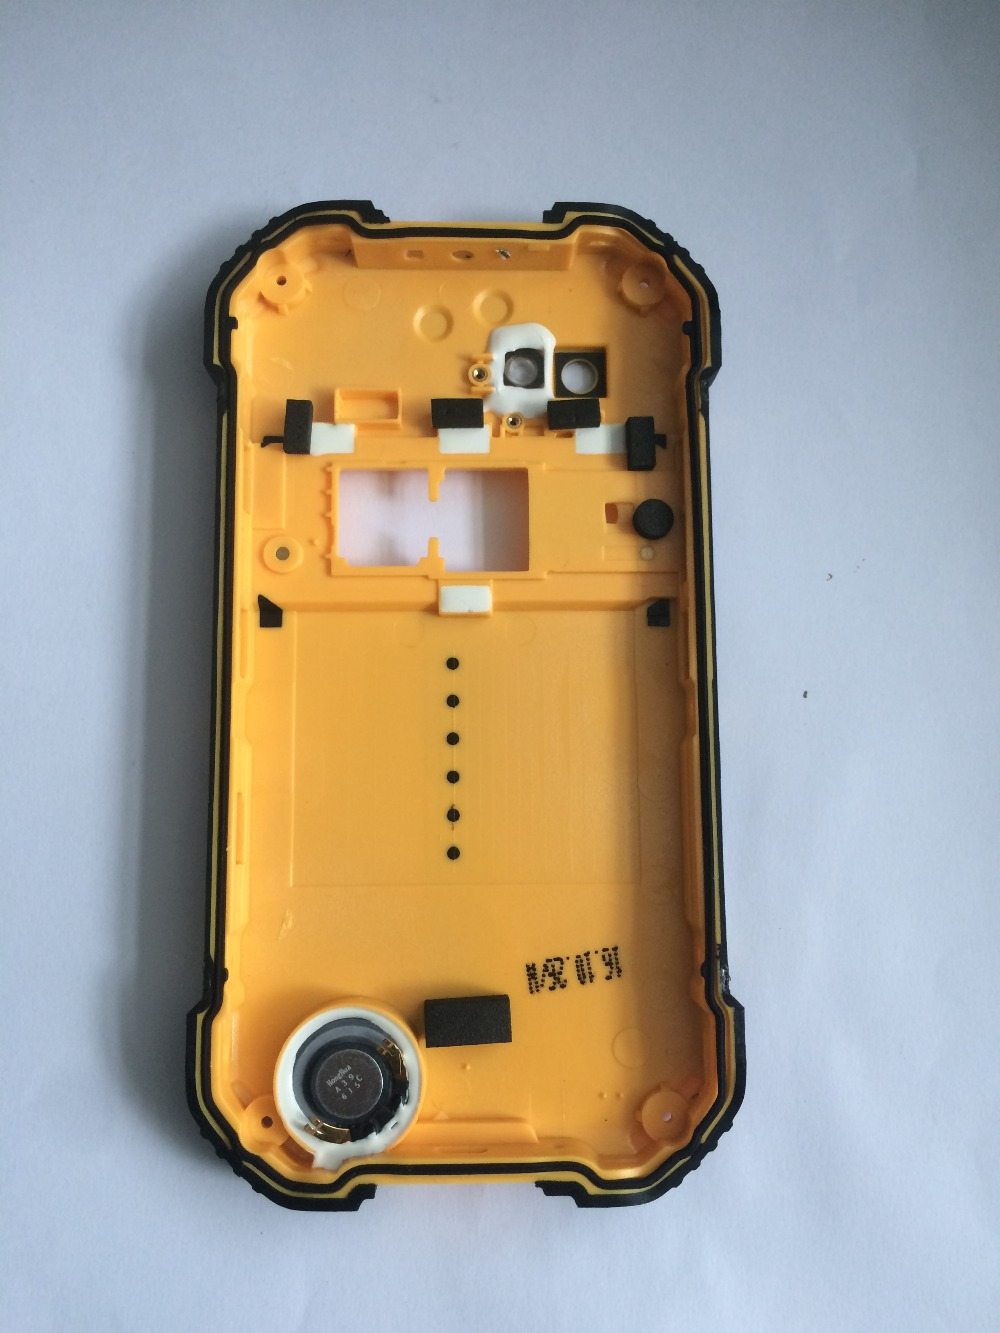 Image 2 - New Blackview BV6000 Battery Cover Back Shell+Loud Speaker For Blackview BV6000S Phone Free shipping+tracking number-in Mobile Phone Housings & Frames from Cellphones & Telecommunications on